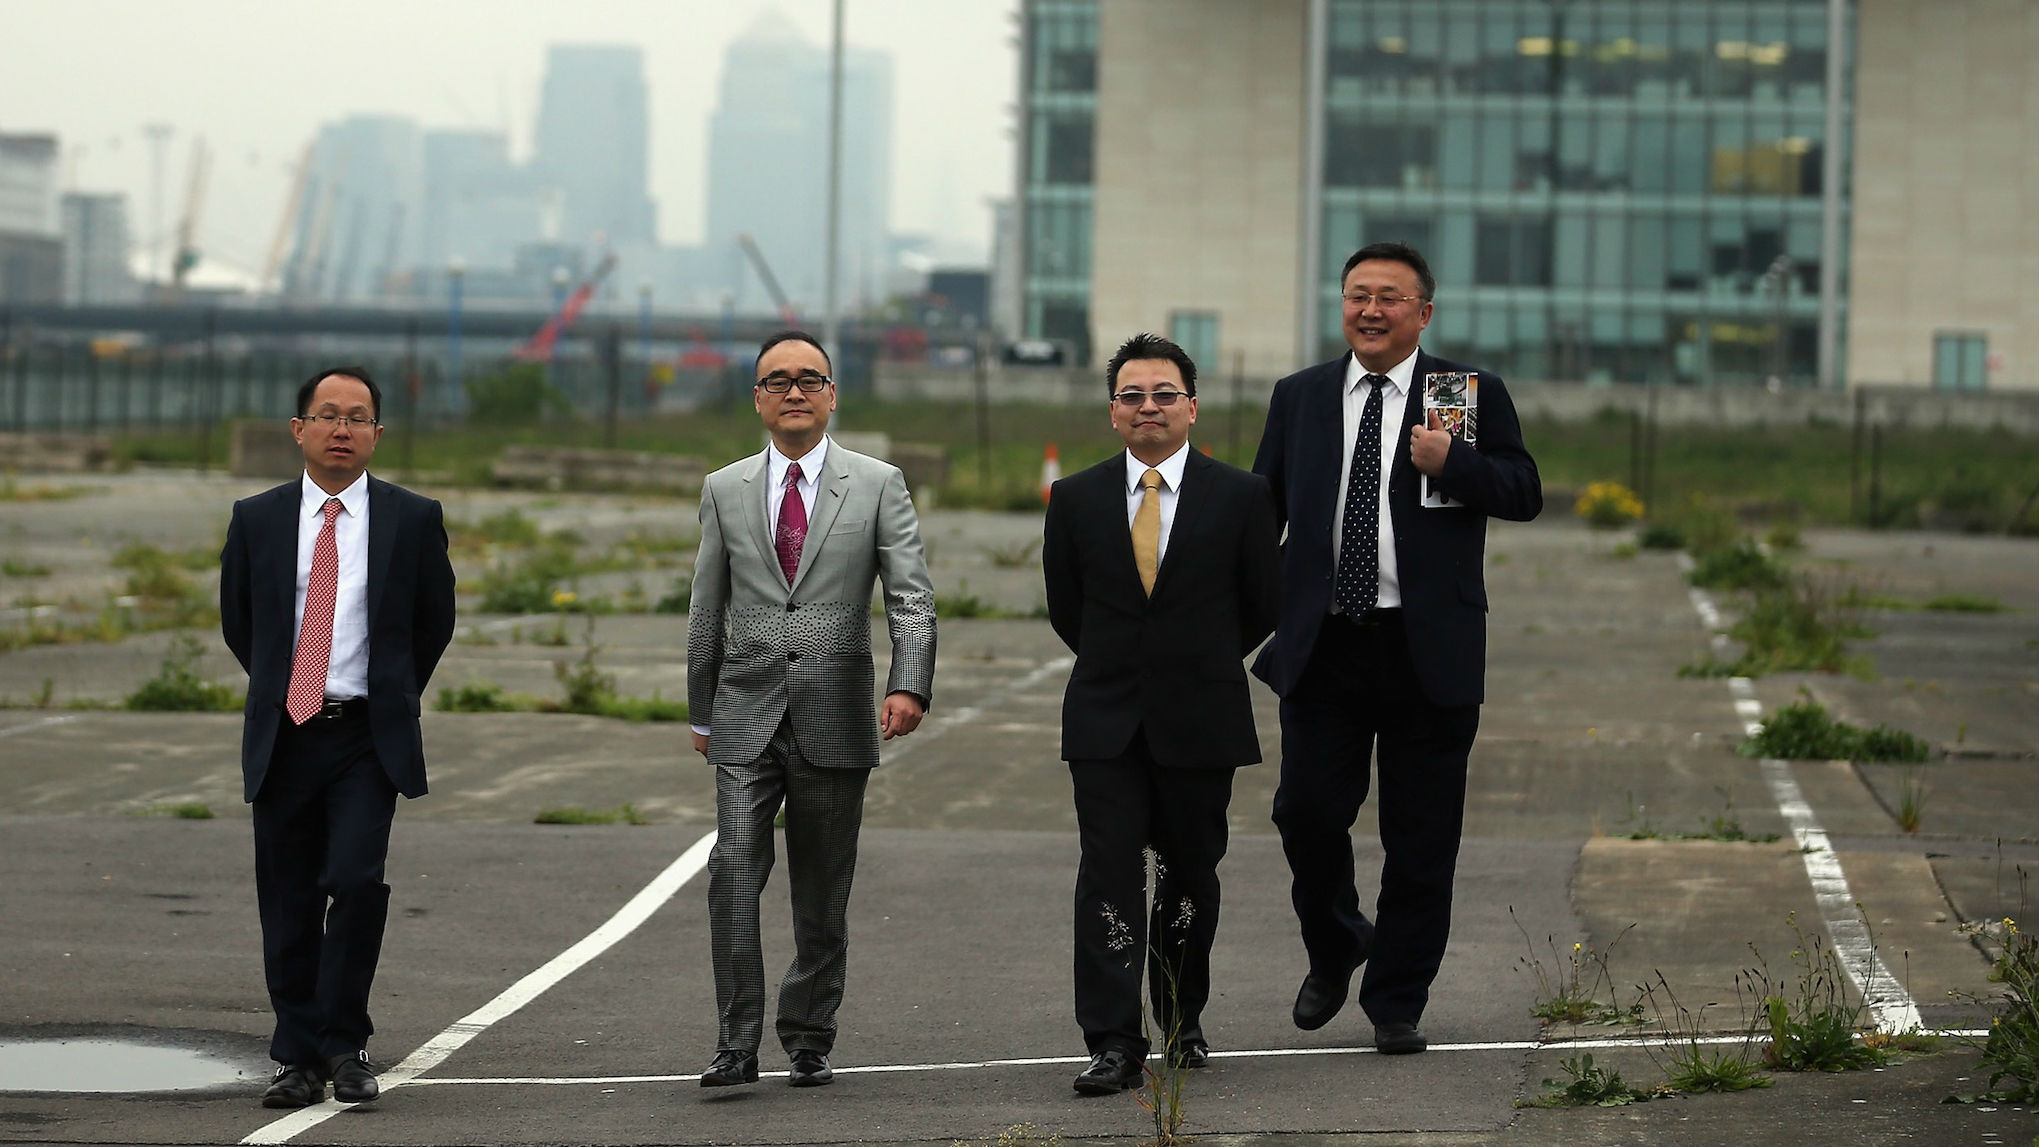 London docklands China web